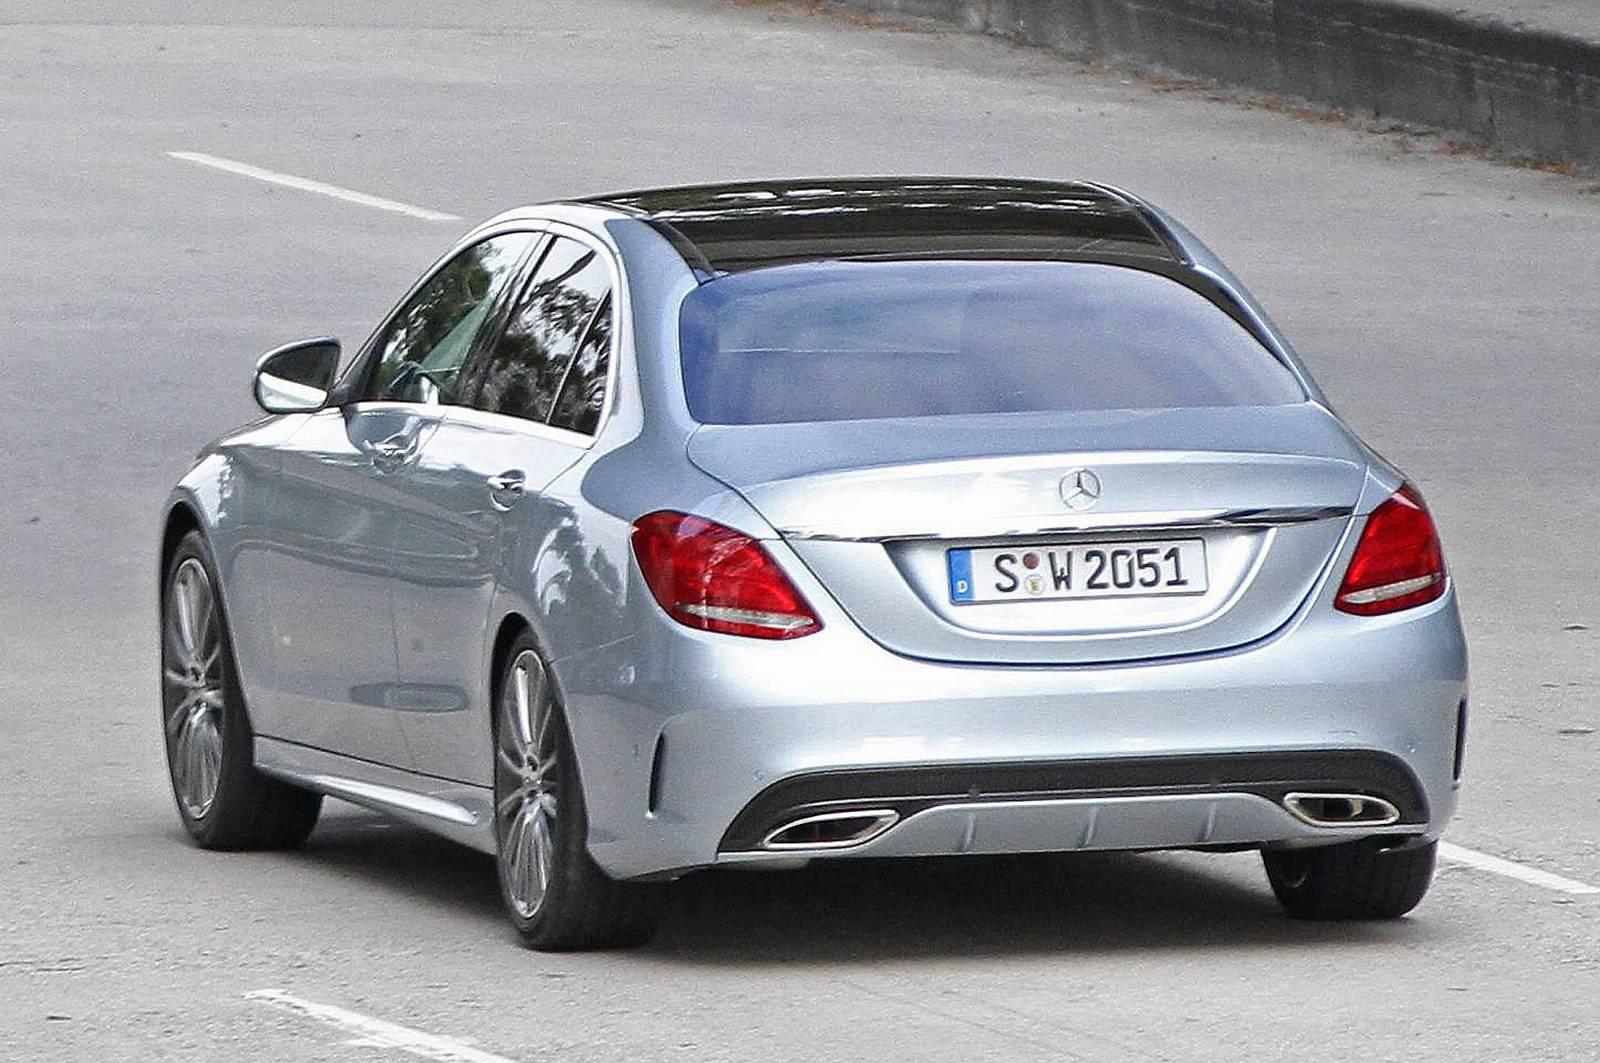 2015 mercedes benz c class sedan review msrp mpg for Mercedes benz mpg